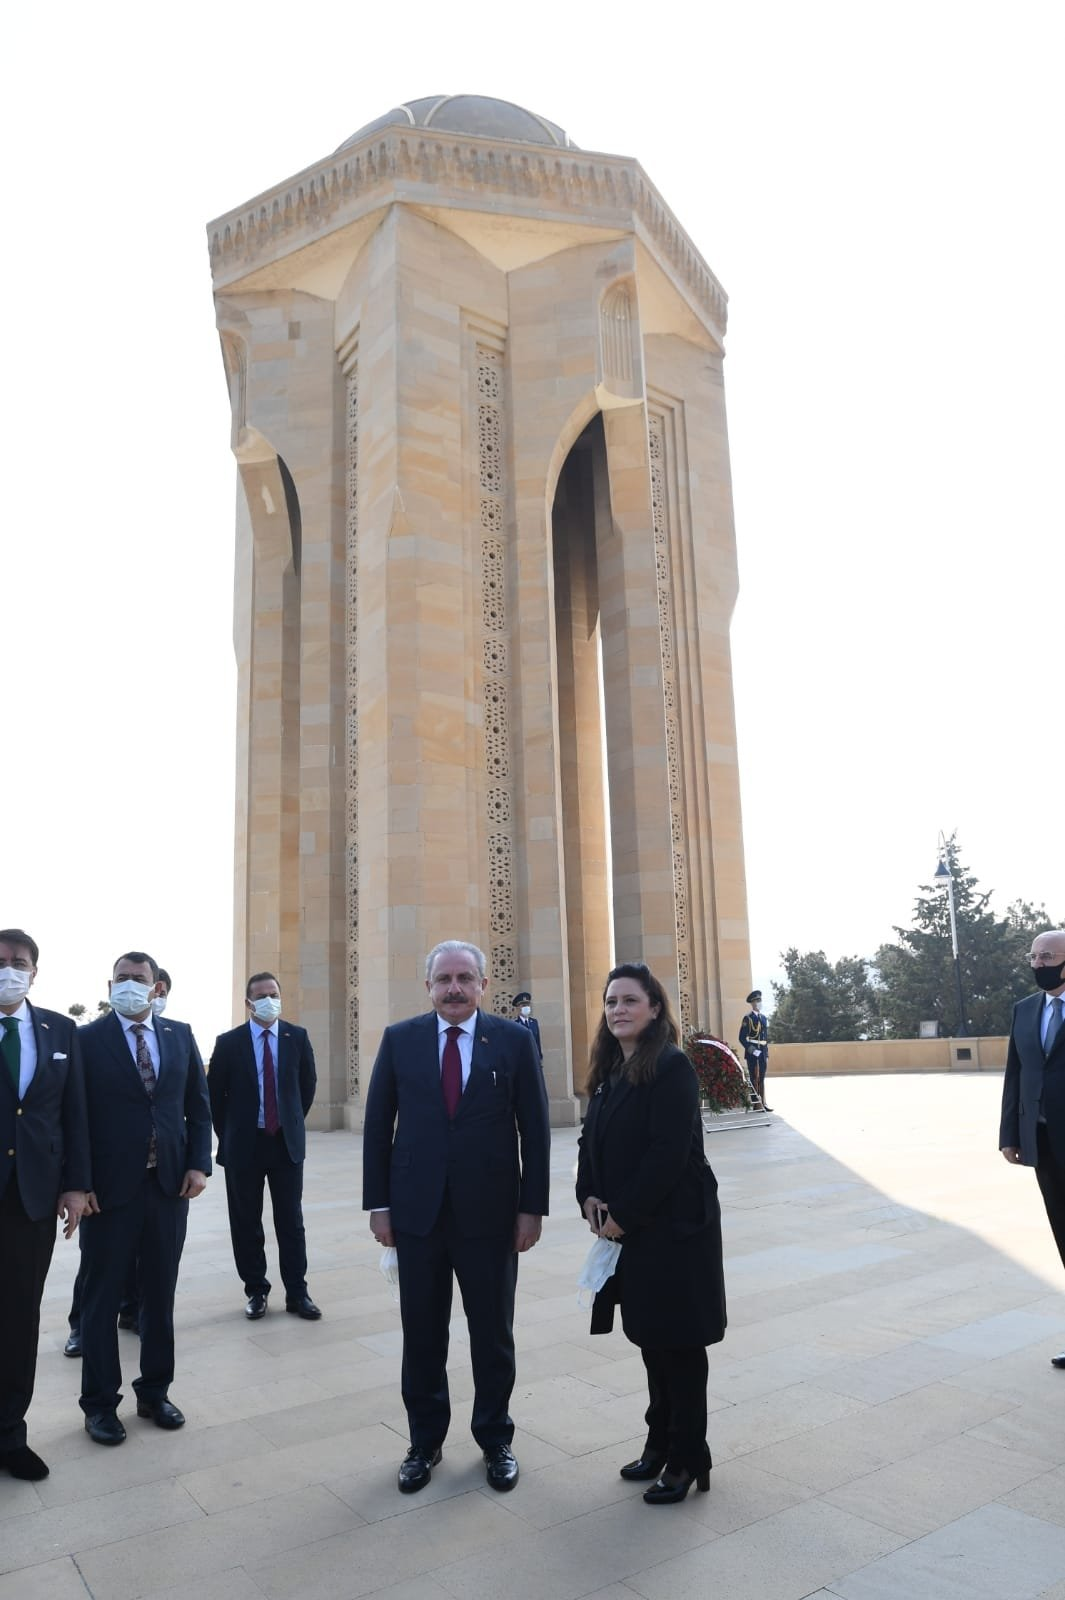 Turkey's Parliament Speaker Mustafa Şentop with Daily Sabah Ankara Bureau Chief Nur Özkan Erbay in Azerbaijan's capital Baku on Oct. 19, 2020. (Photo by Daily Sabah)